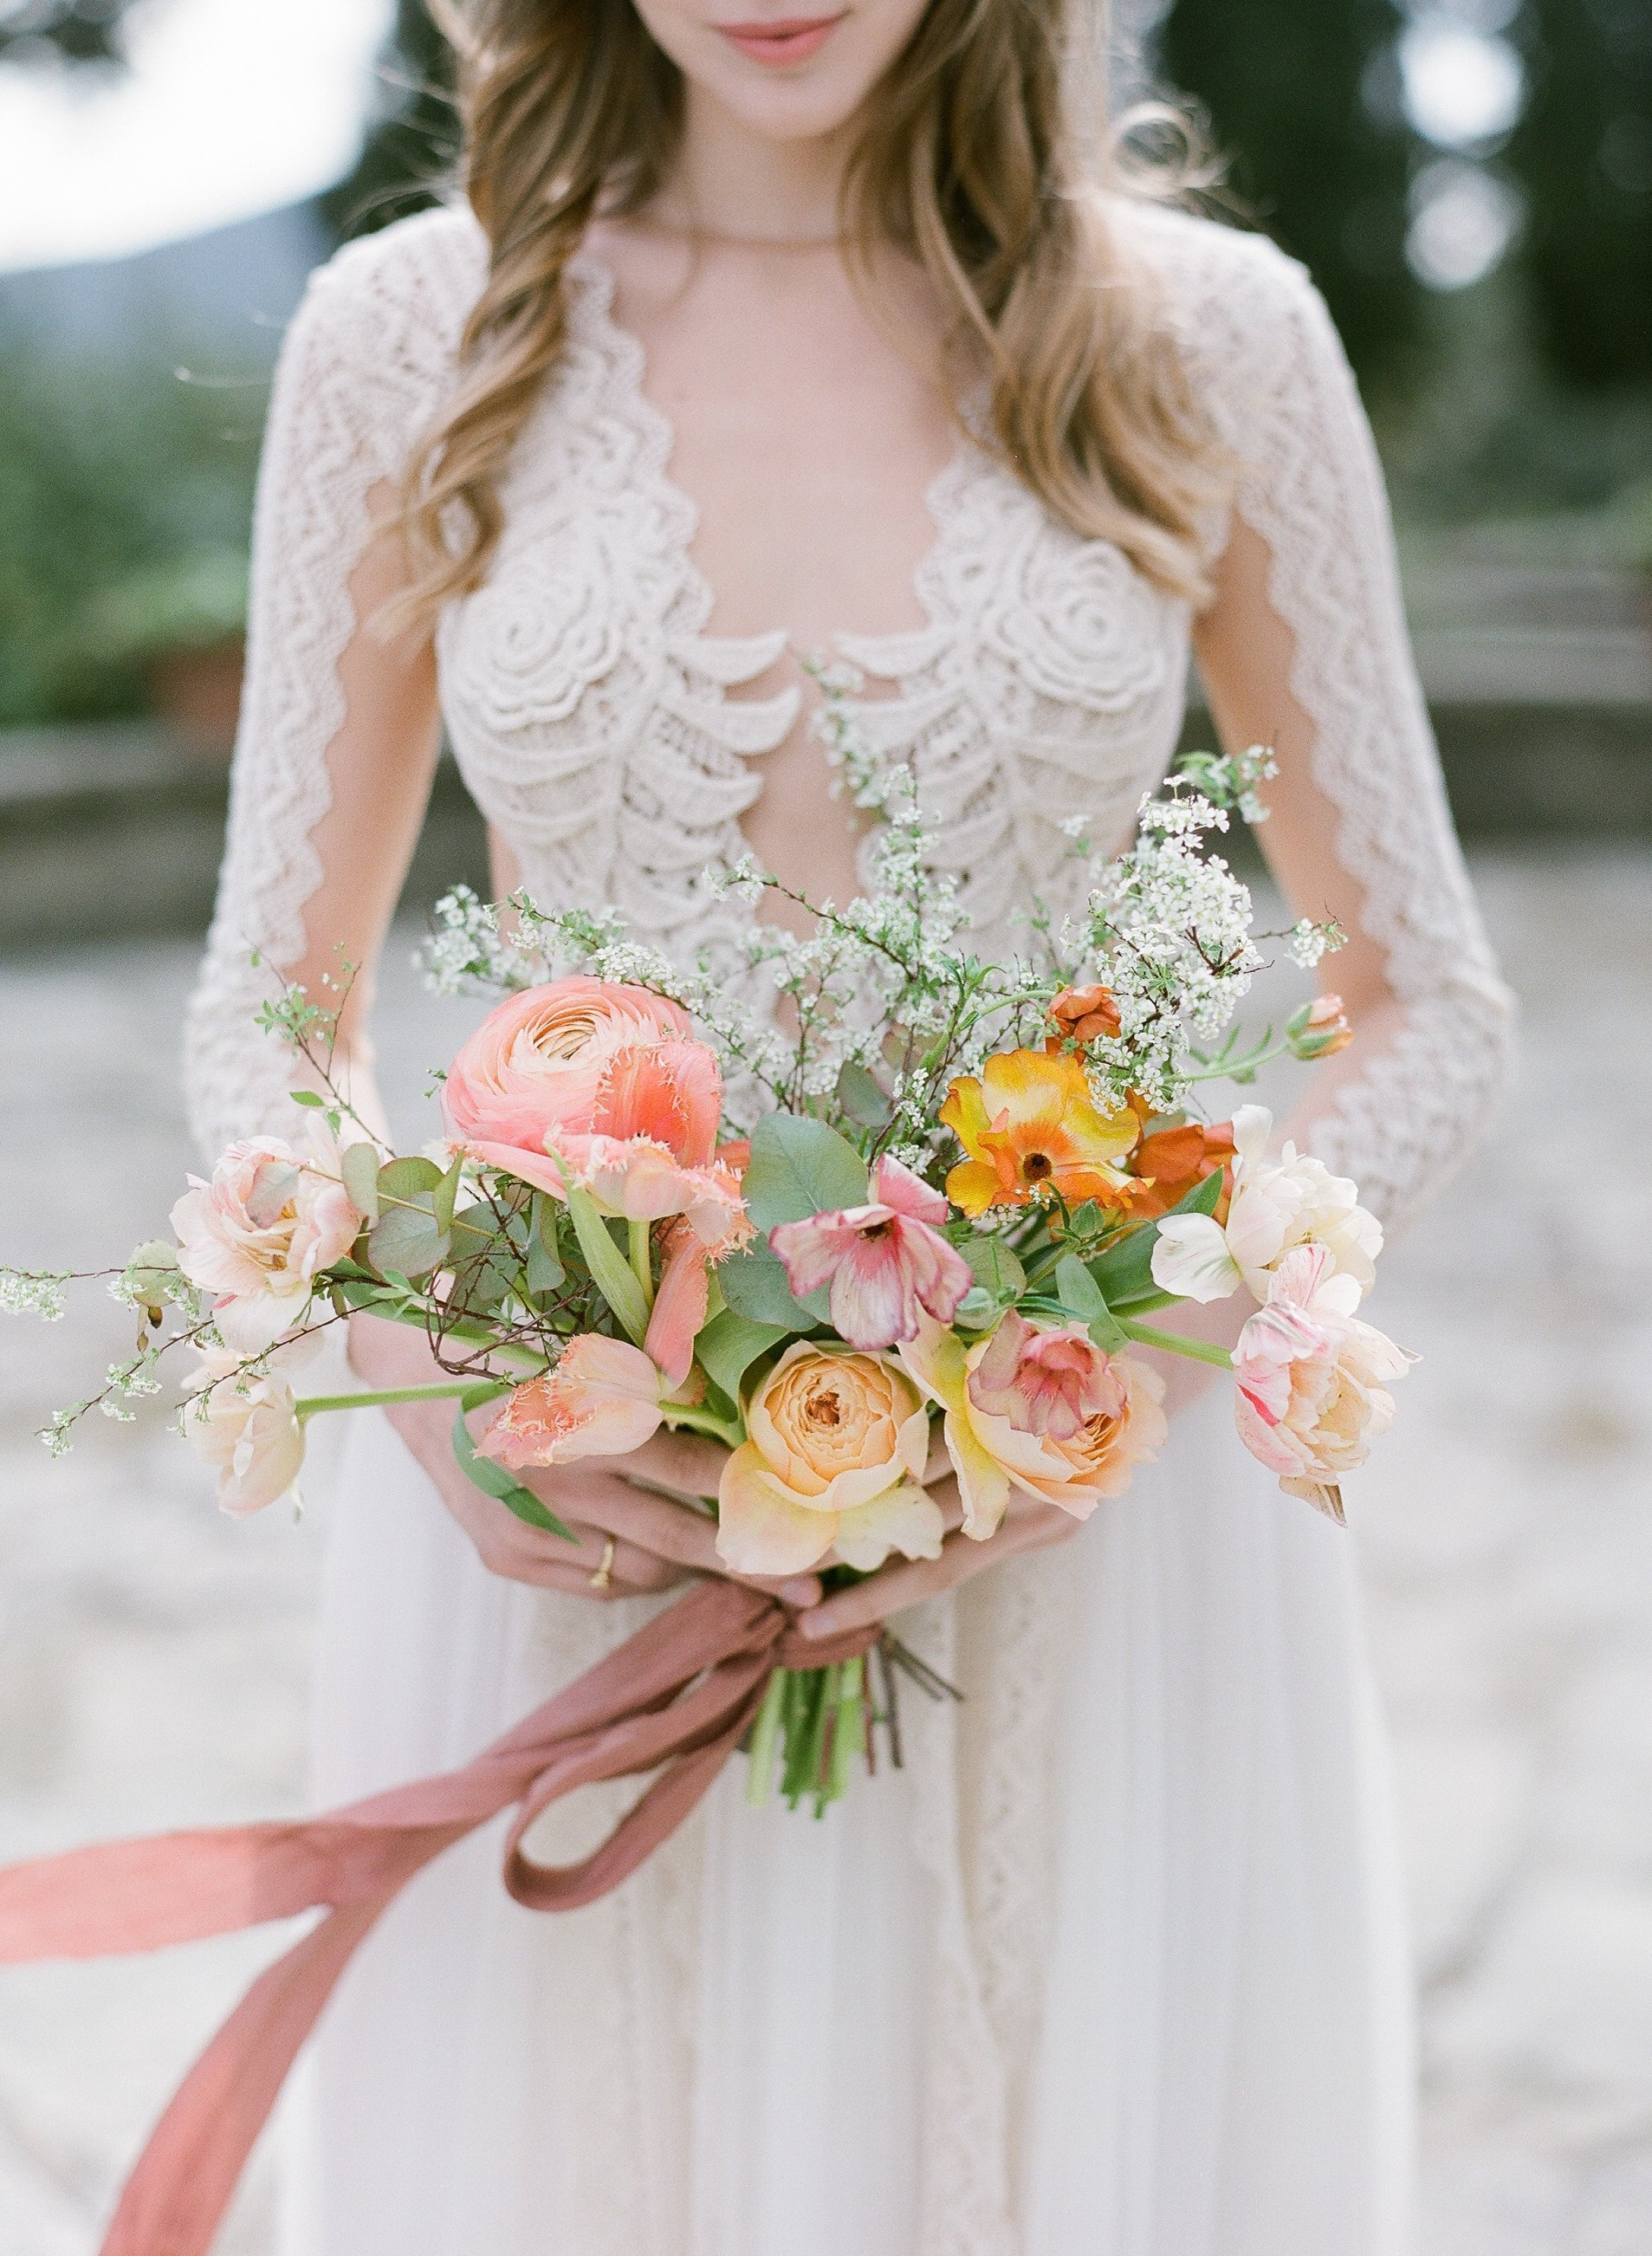 italy-spain-barcelona-elopement-wedding-planner-flower-designer-30015